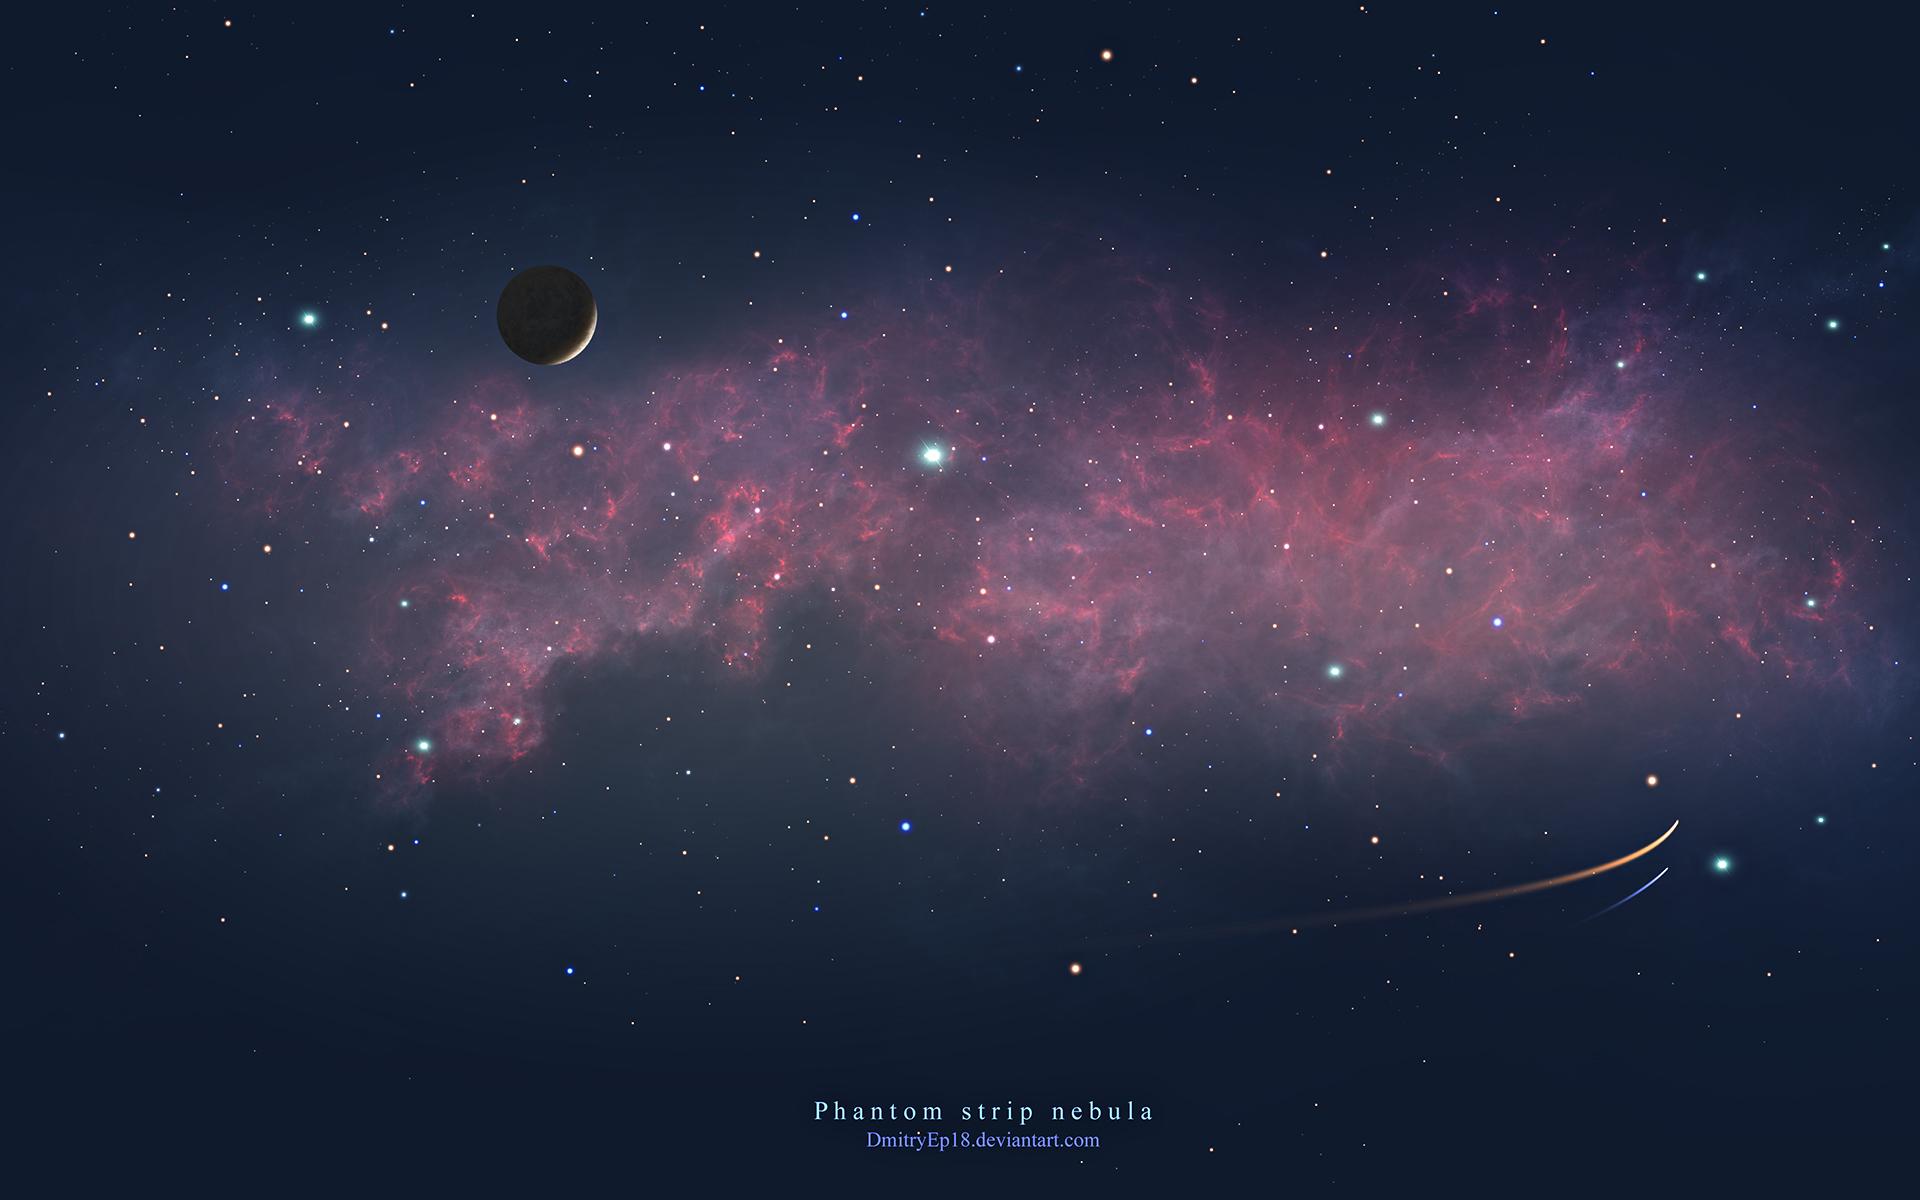 Phantom strip nebula by DmitryEp18